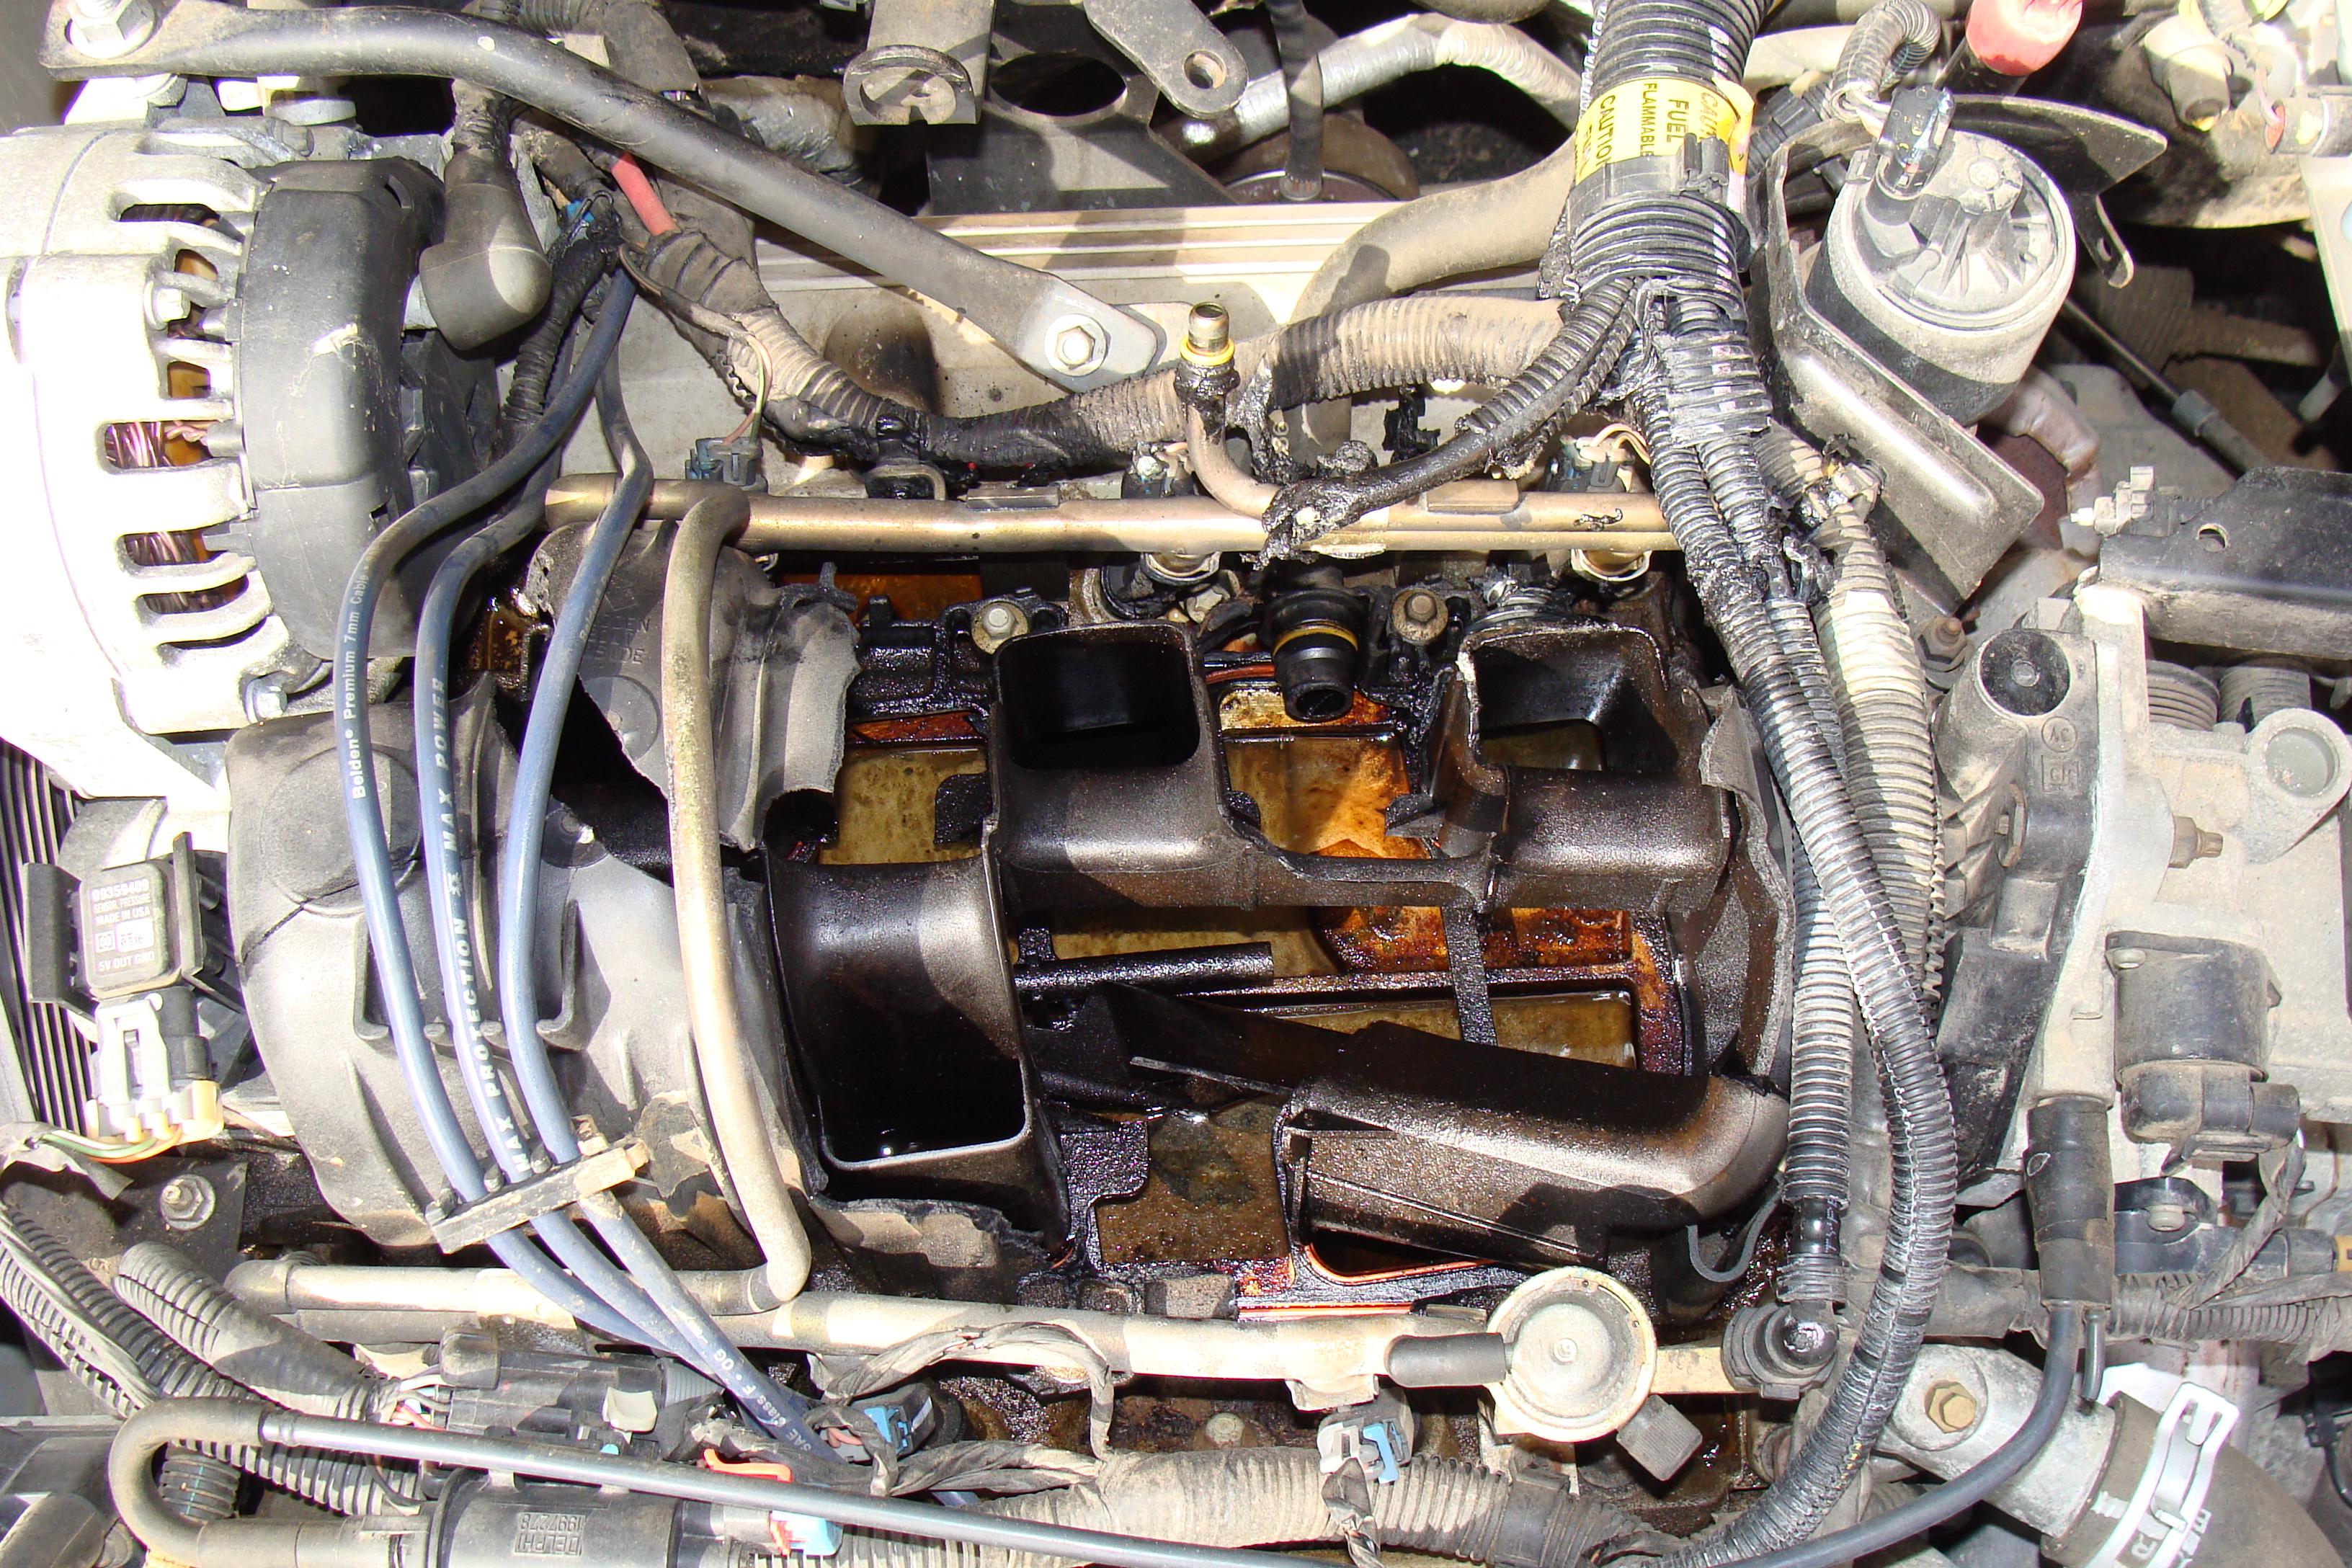 Chevy Starter Wiring Diagram On Century Motor Wiring Diagram Lead